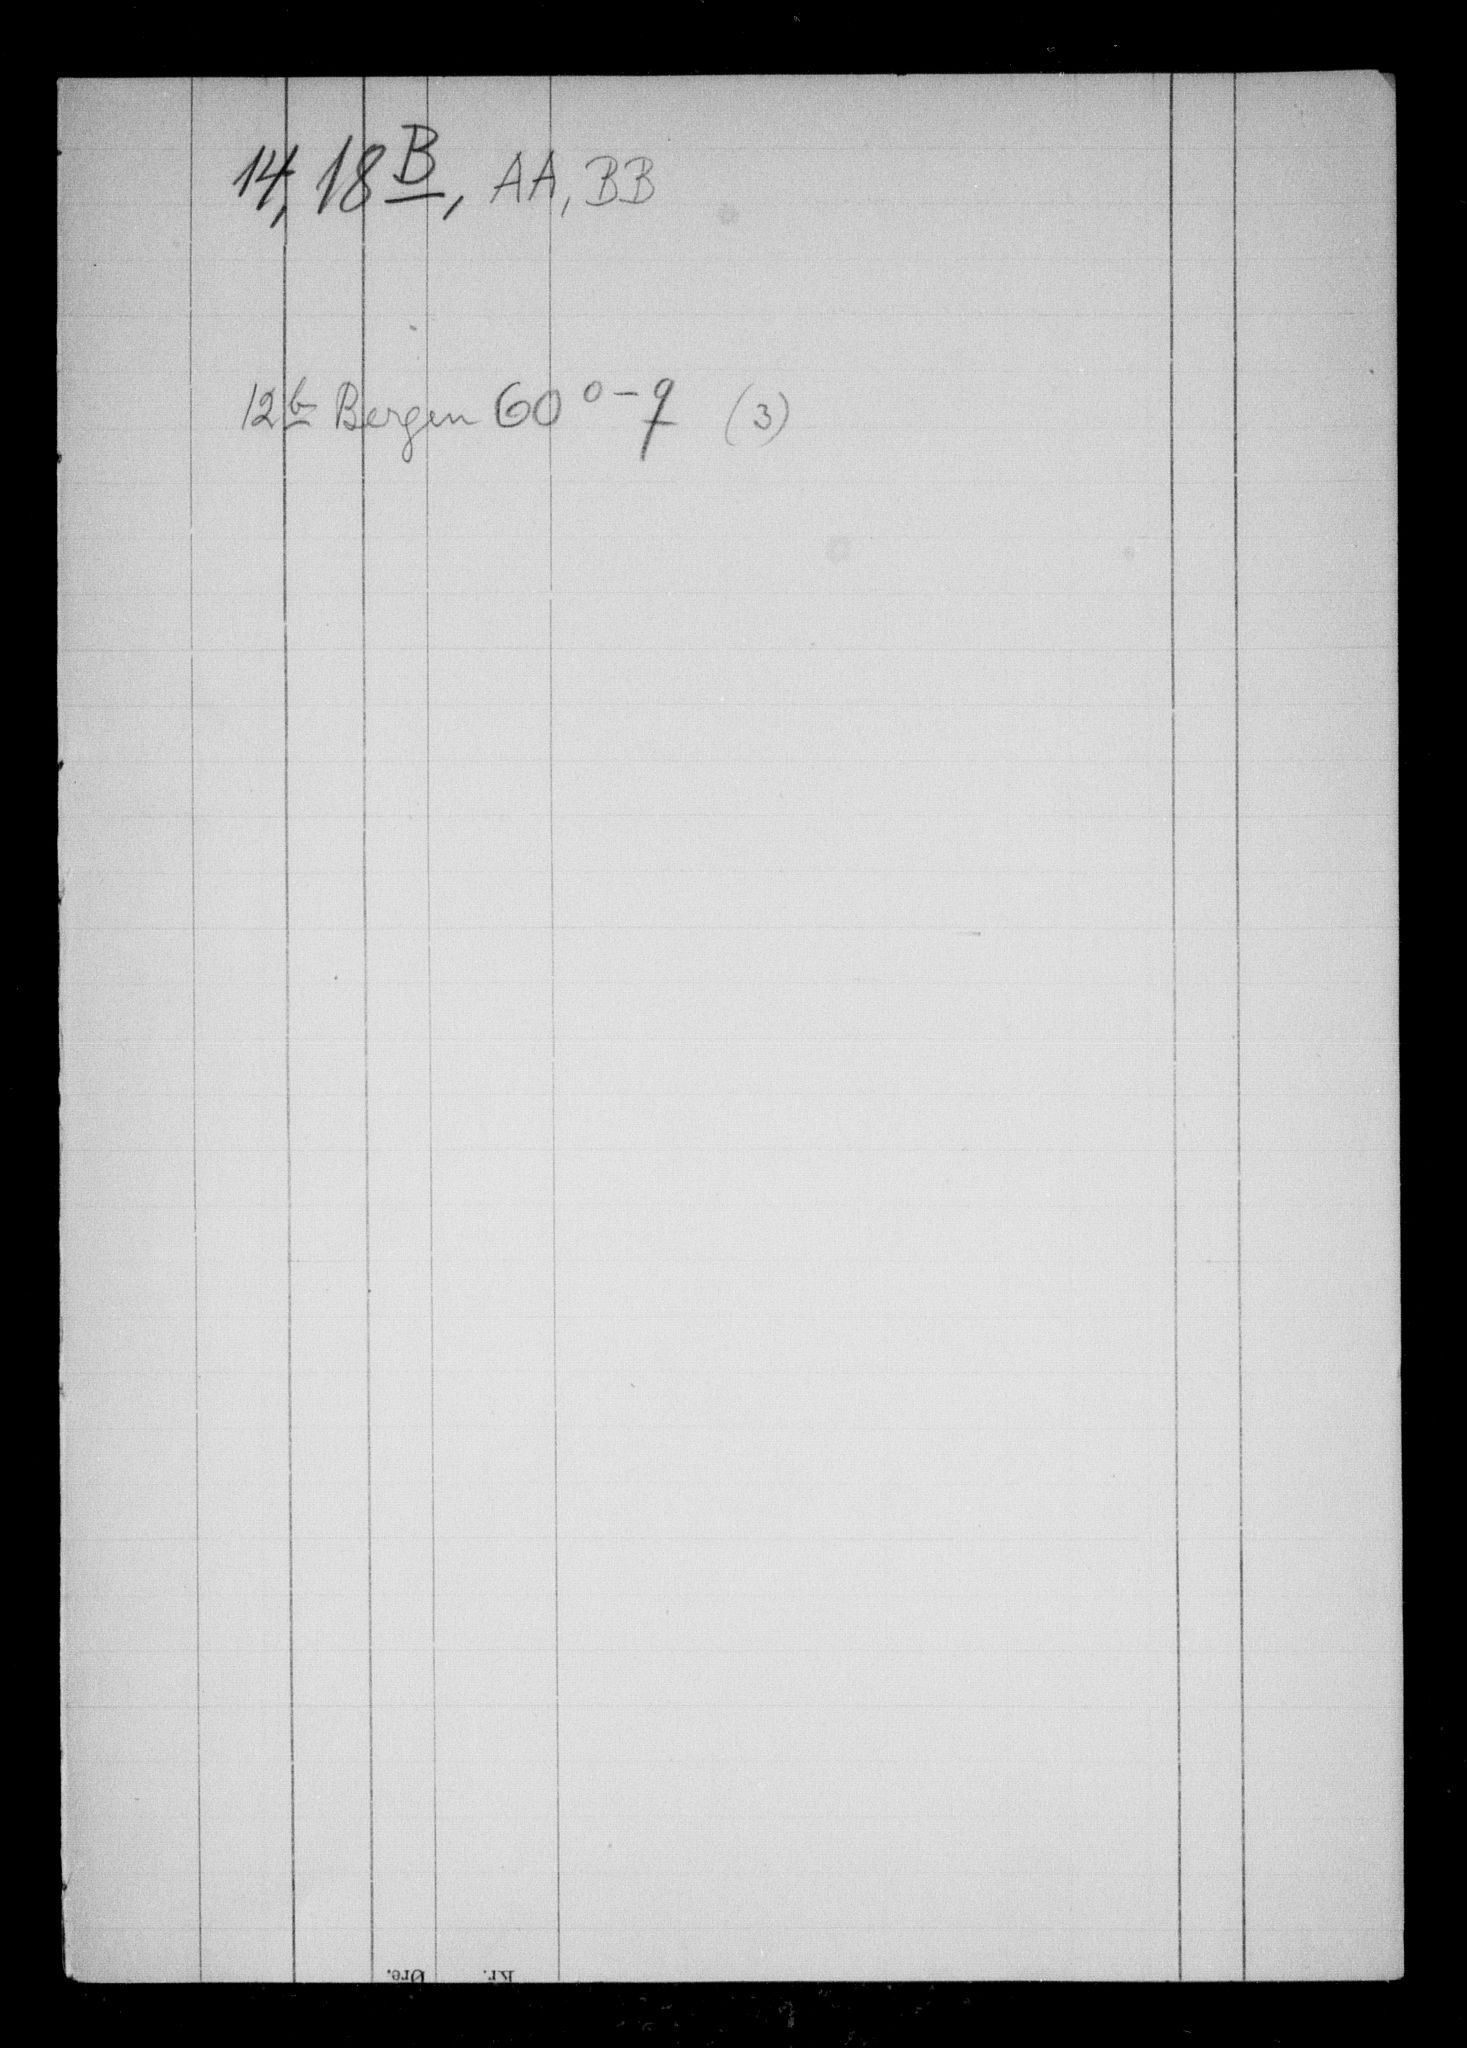 RA, Danske Kanselli, Skapsaker, F/L0056: Skap 14, pakke 18B, litra AA-54, 1590-1722, s. 3